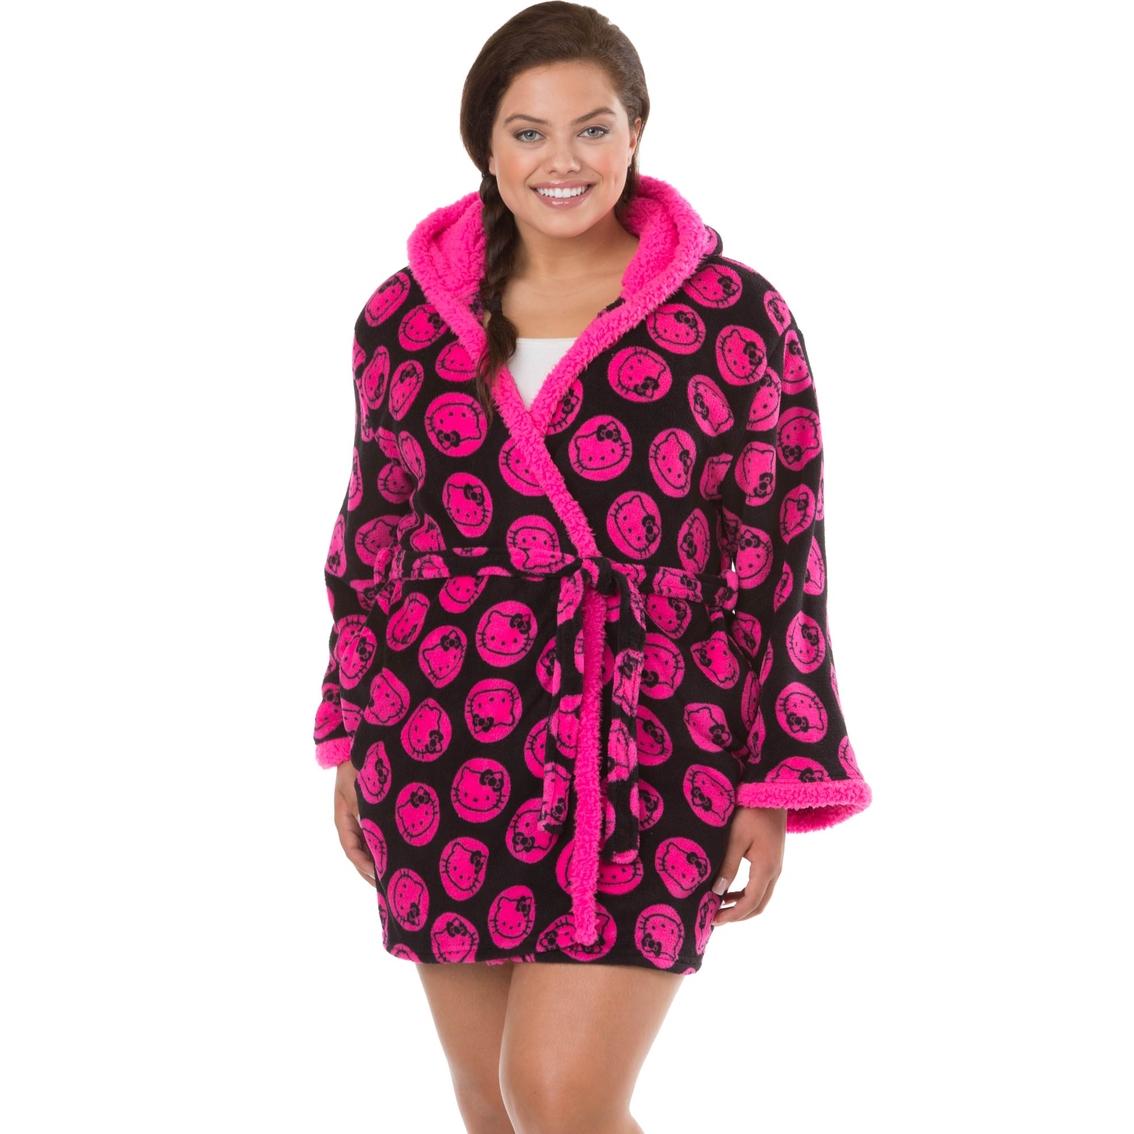 010577800 Hello Kitty Plus Size Kimono Style Robe with Hood, Black and Hot Pink